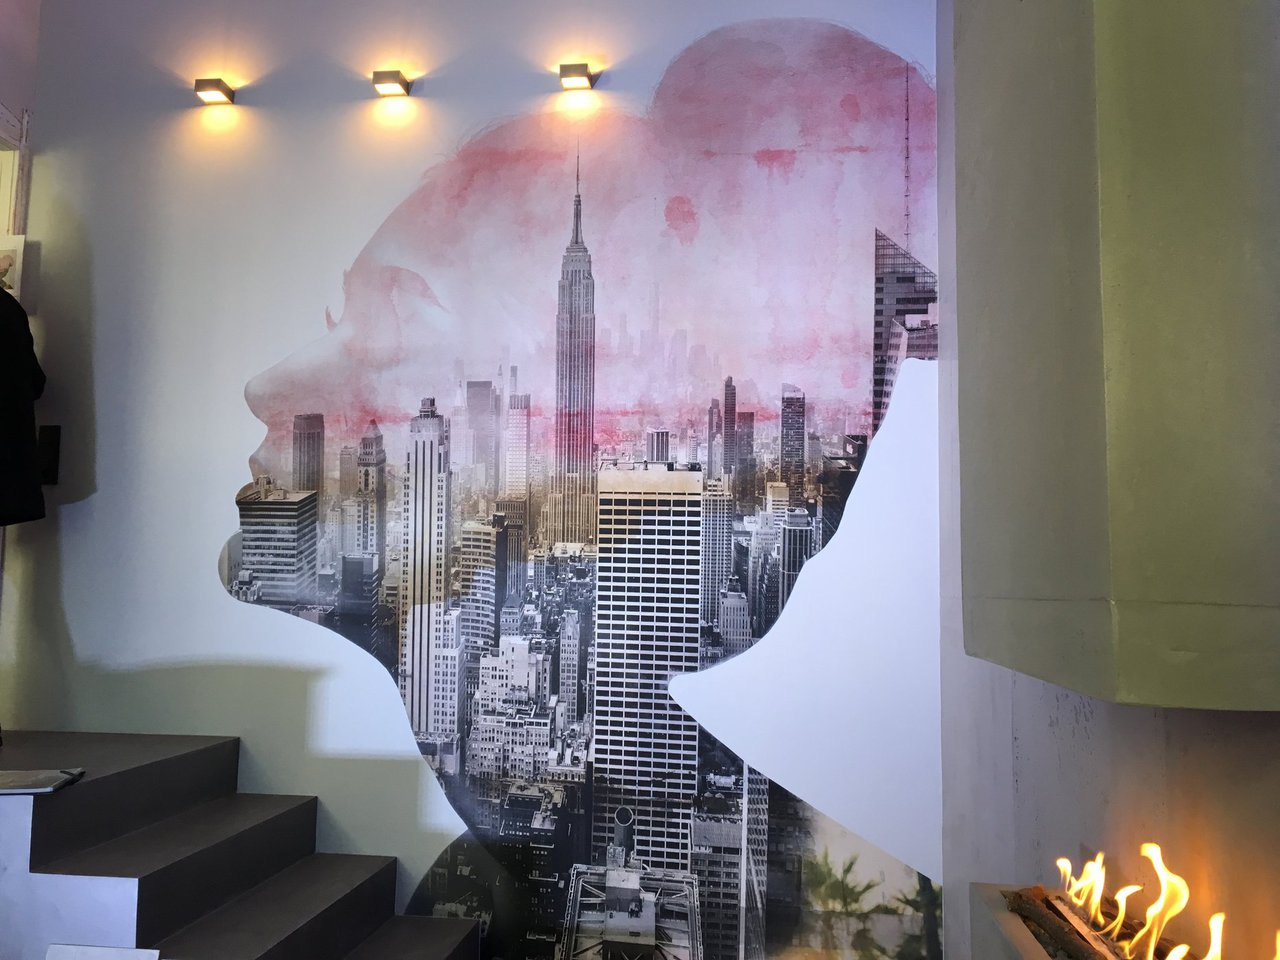 Showroom Eröffnung -Malerische Wohnideen - Jessica Jörges